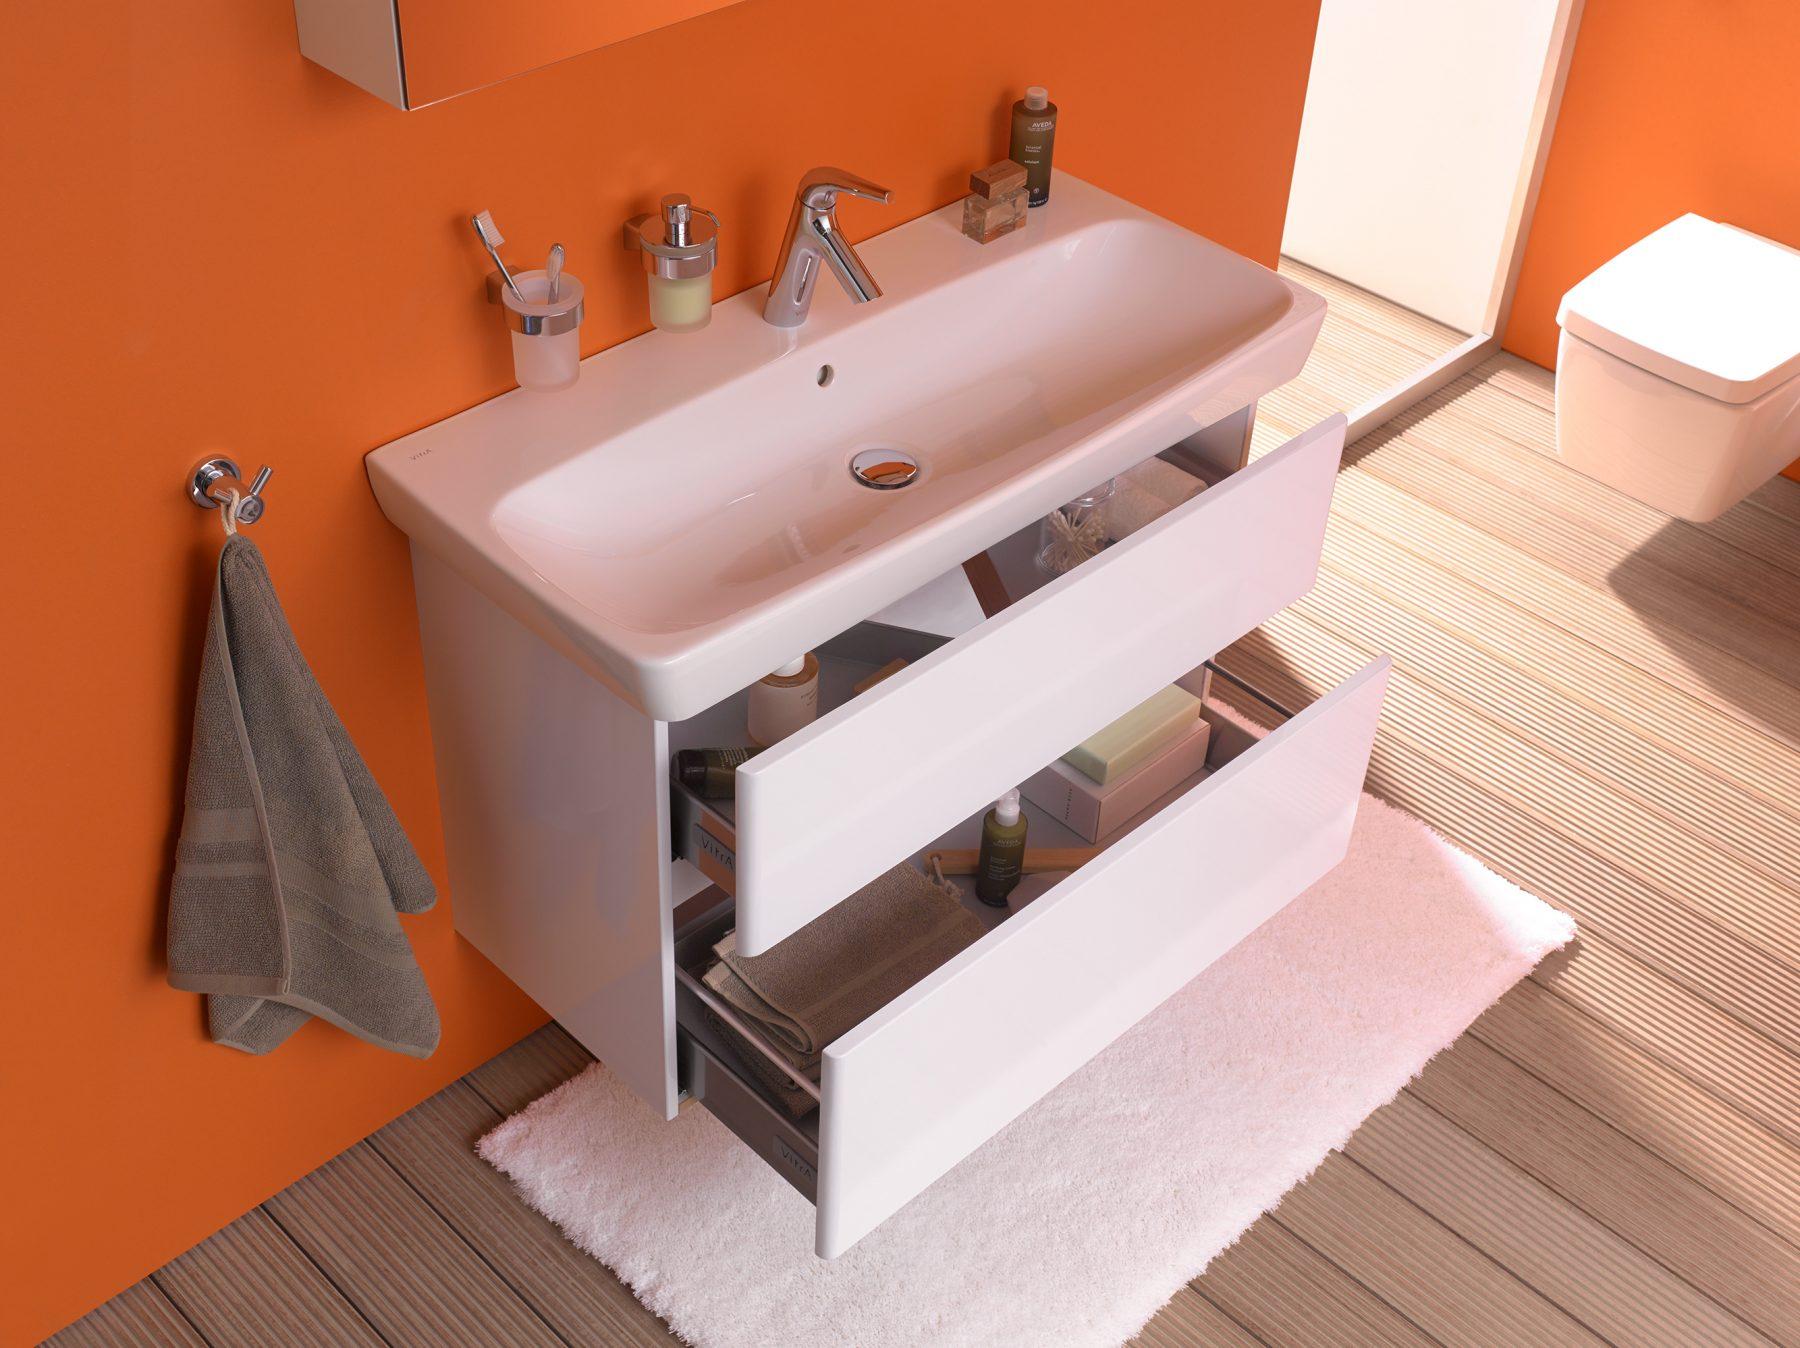 Mobilier de salle de bain suspendu metropole vitra - Mobilier salle de bain ...